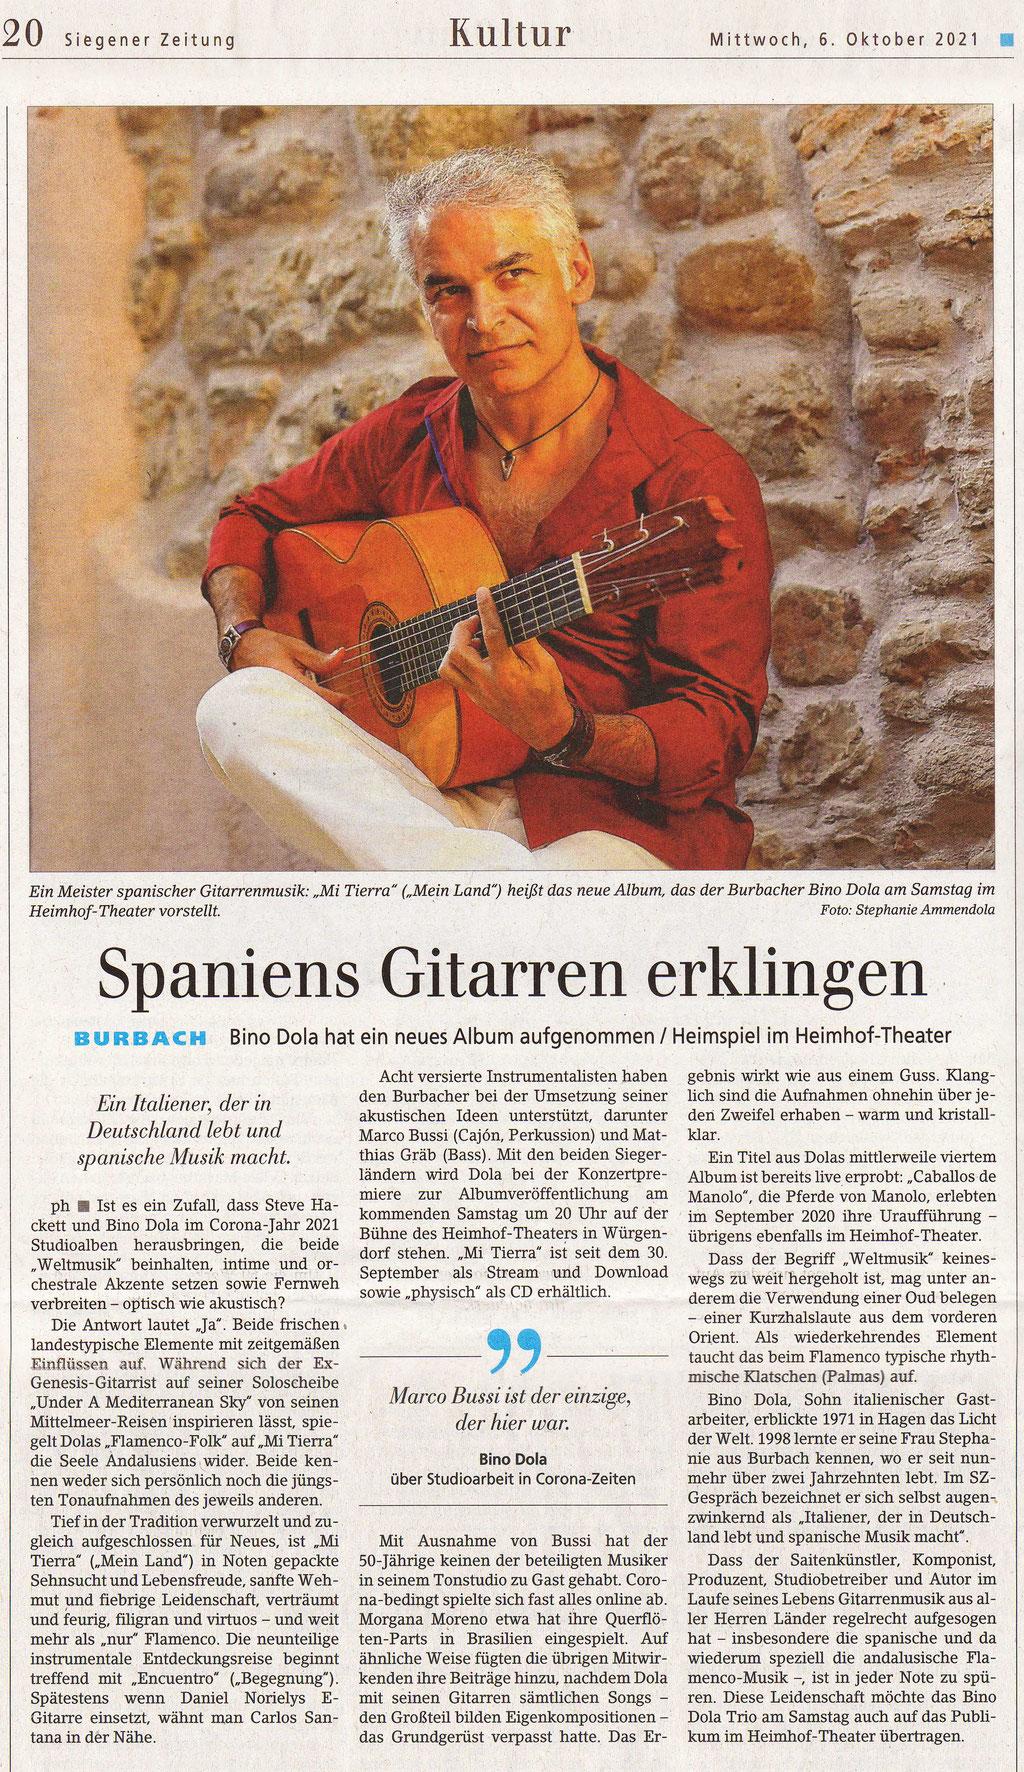 Mi Tierra - Neues Album (Siegener Zeitung, 06.10.2021)